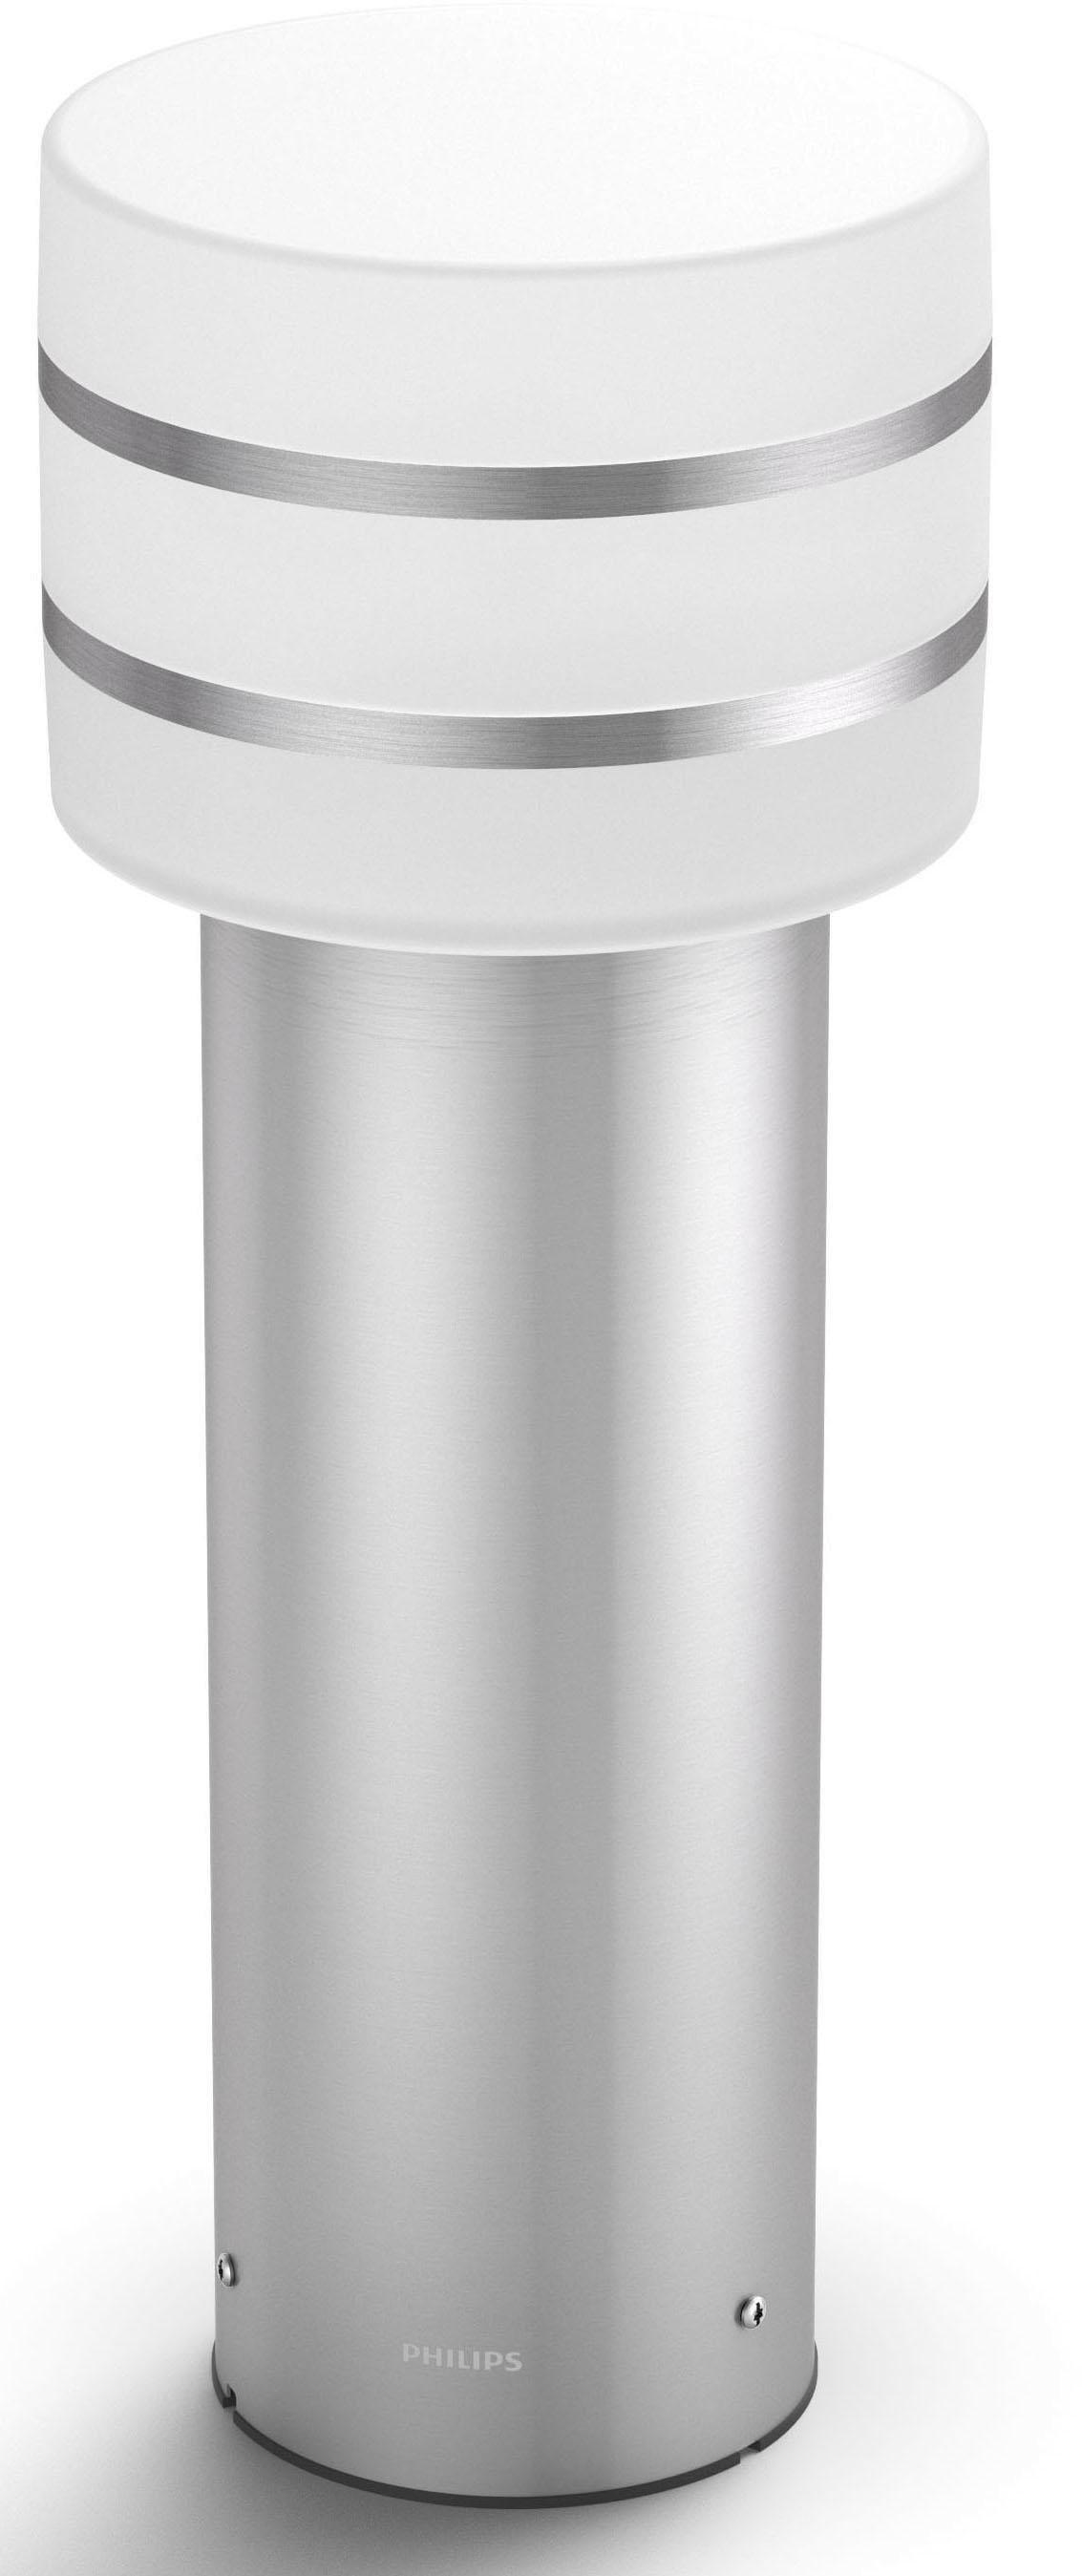 LED Sockelleuchte »Tuar«, 1-flammig, LED Außenleuchte - smartes LED-Lichtsystem mit App-Steuerung